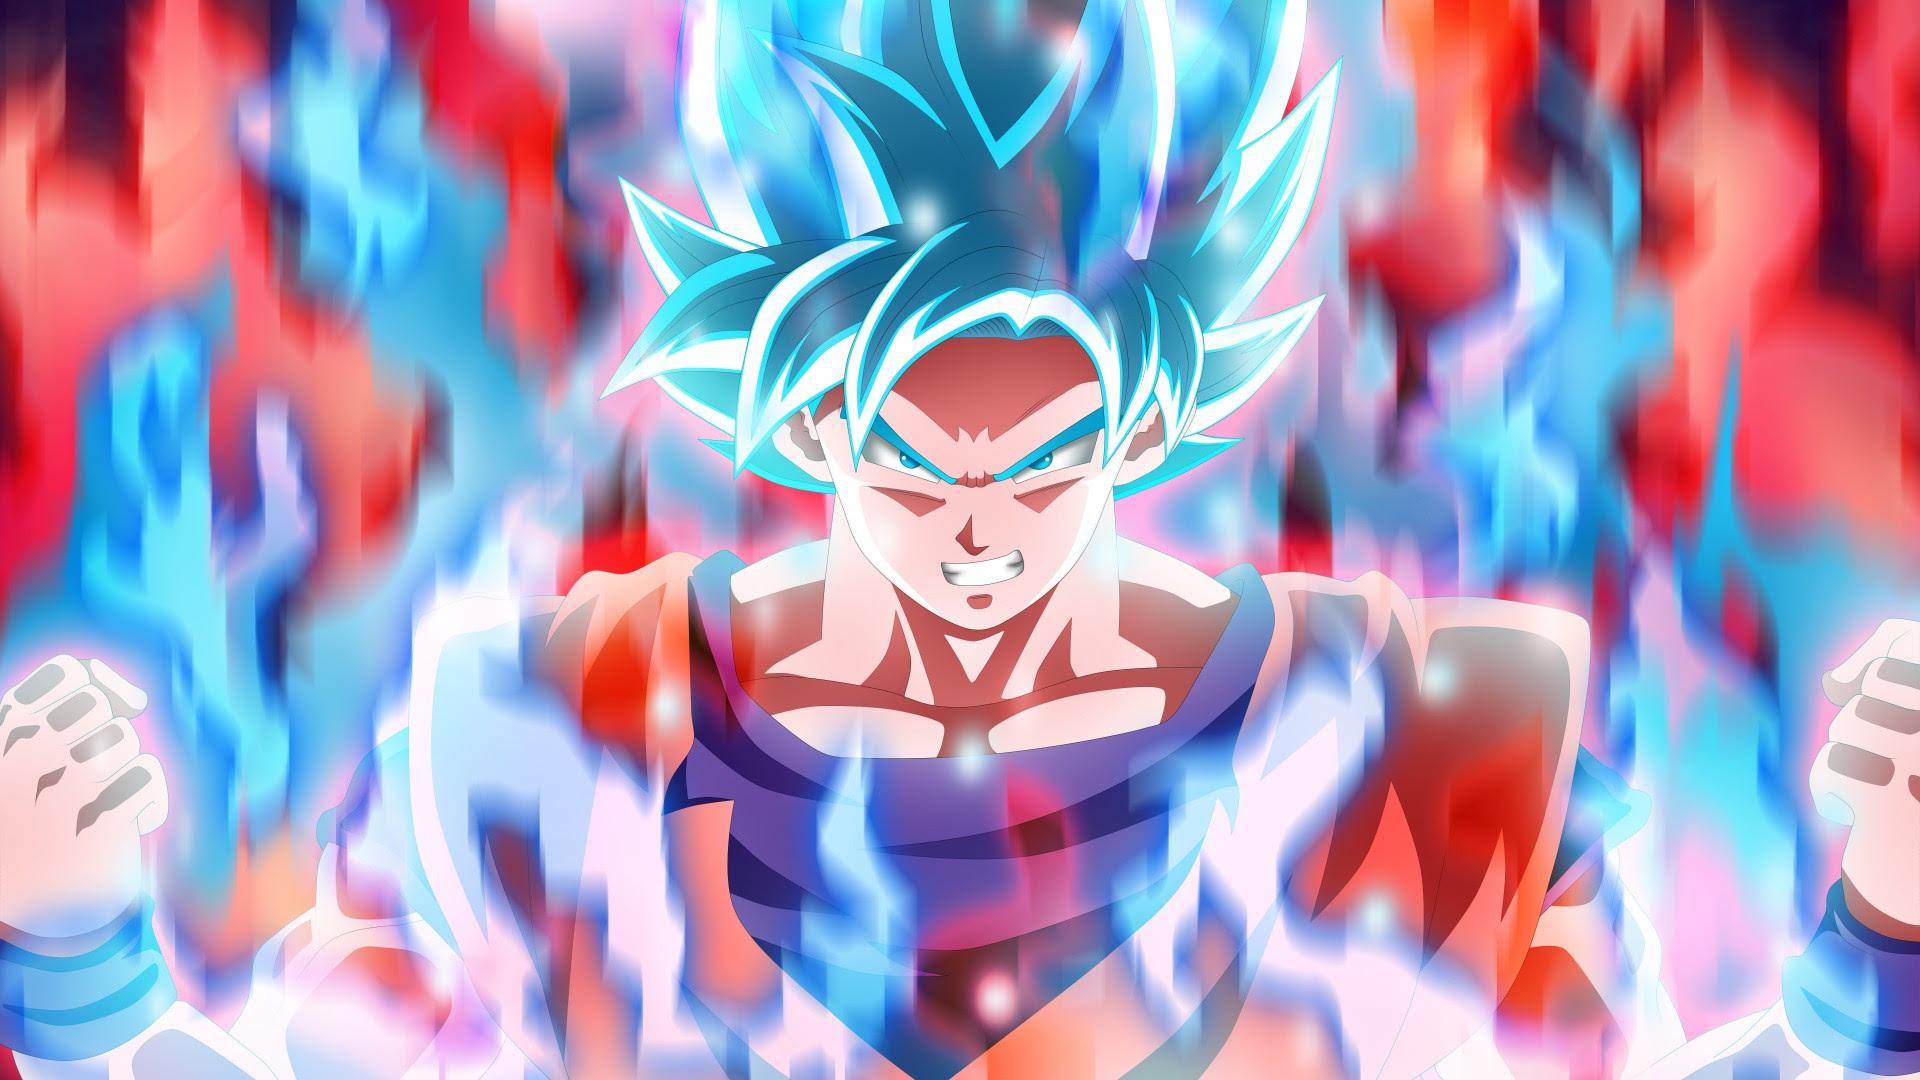 Goku Dragon Ball Super 5K Wallpapers  HD Wallpapers  ID 20081